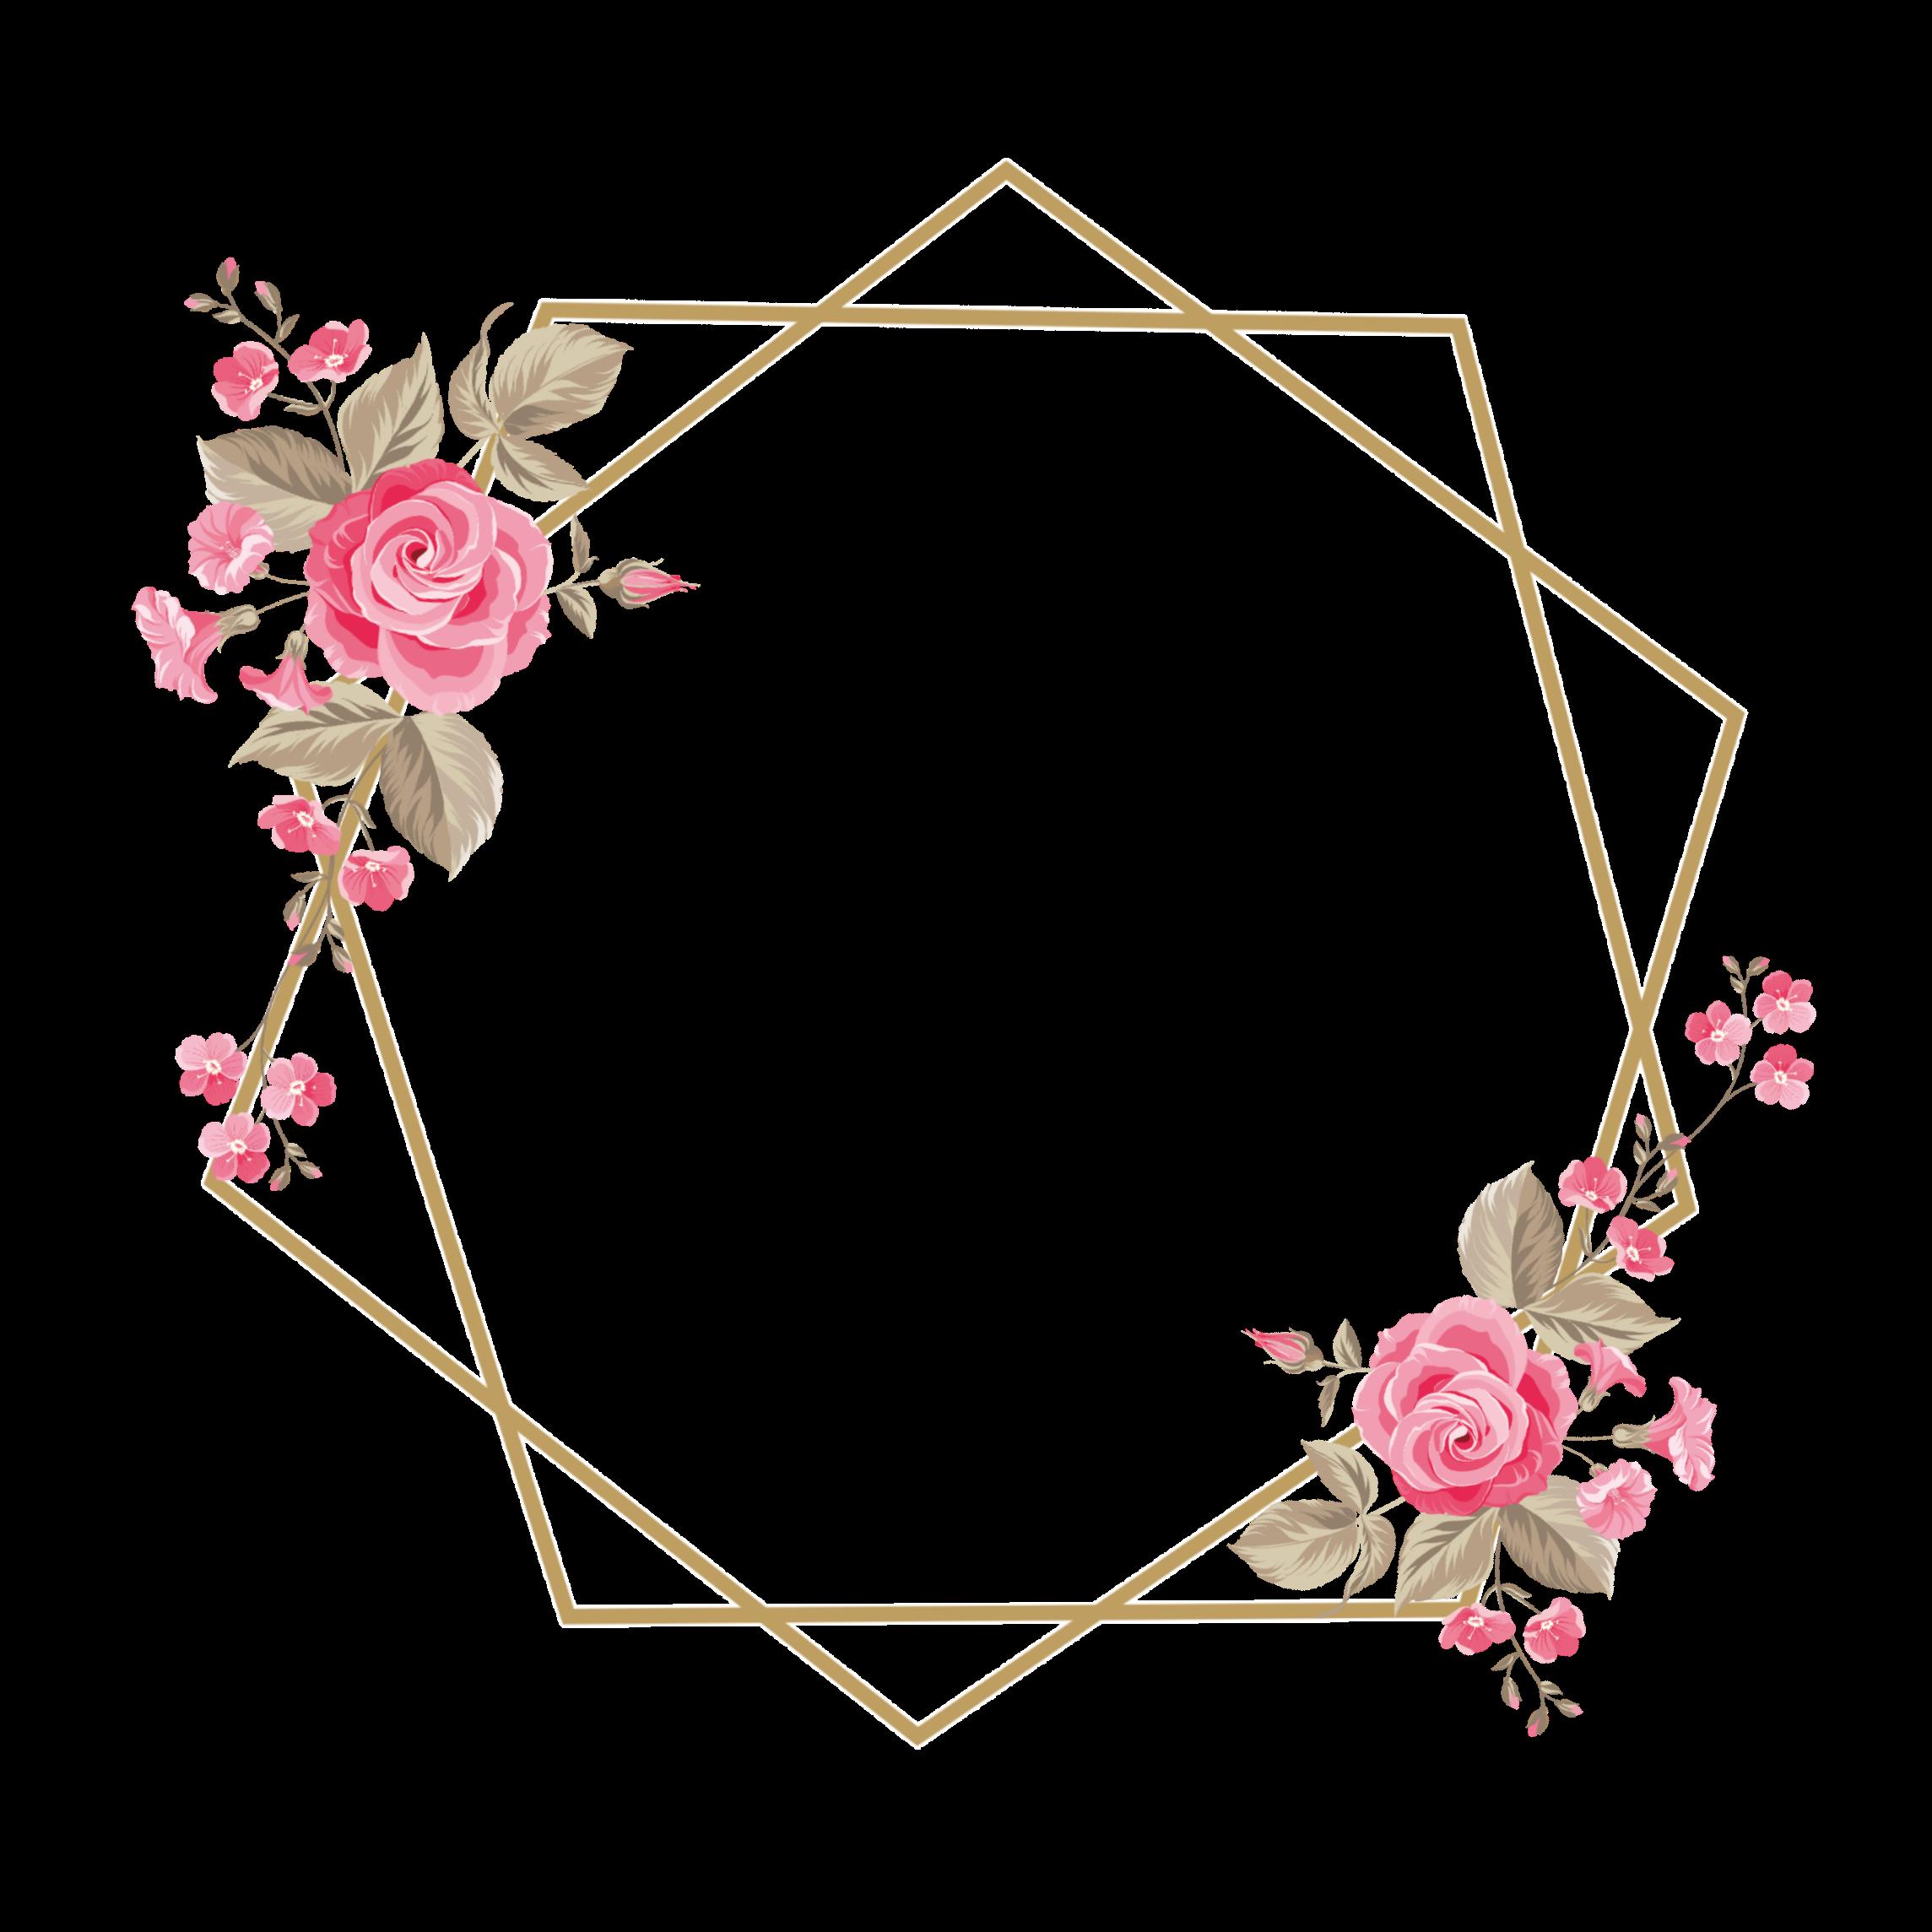 Sticker By Azhaaralzadjalia Freetoedit Frame Rose Flower Pink اطار ورد وردي Remixed From San Dra Br Mashael Kartu Pernikahan Kartu Bunga Ide Wisuda